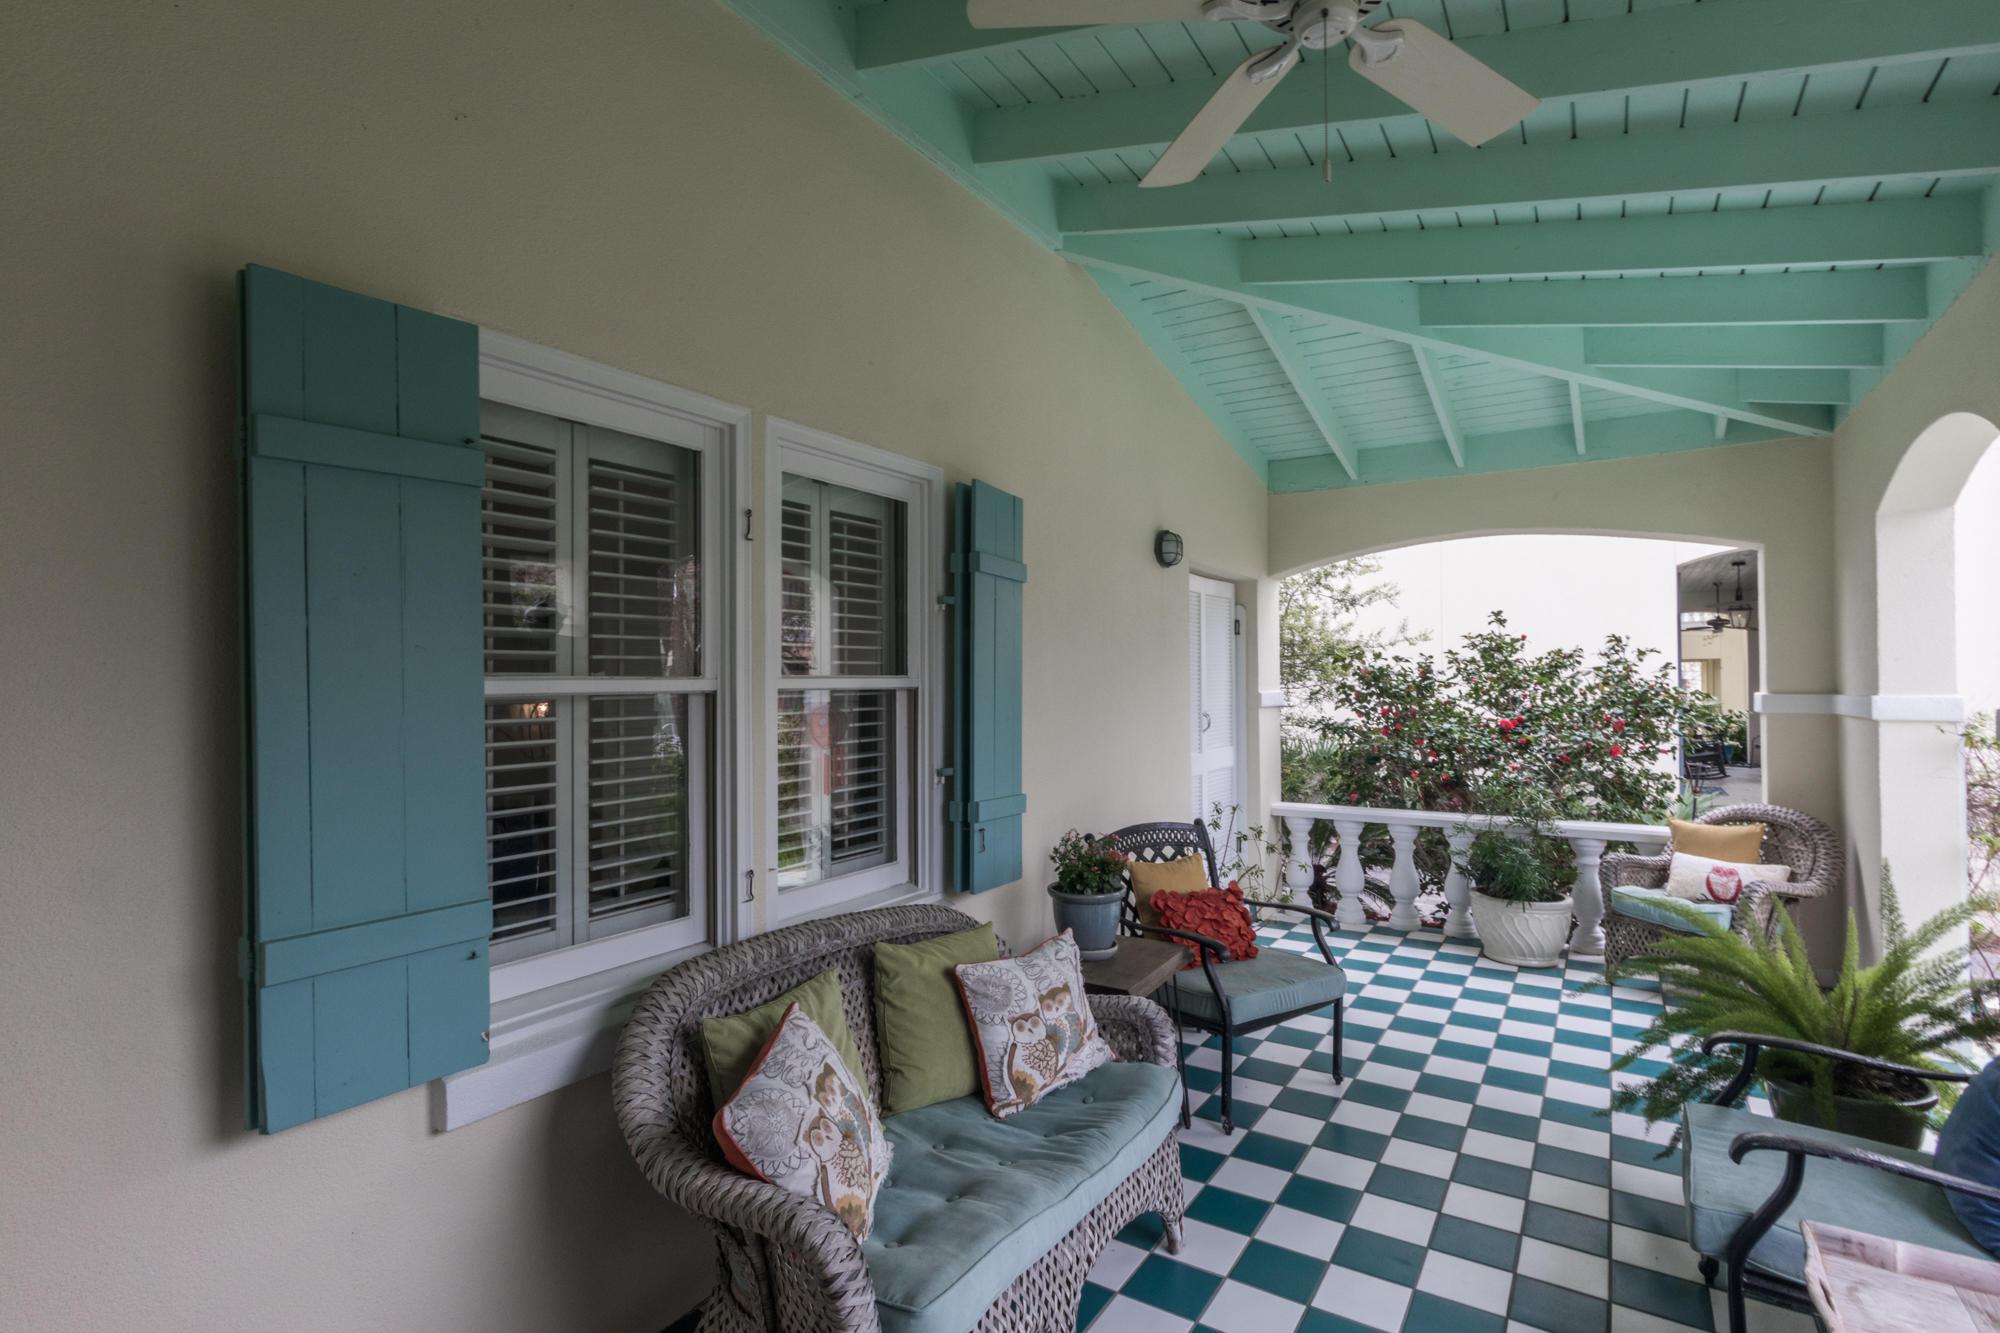 A 3 Bedroom 3 Bedroom Caribe Home